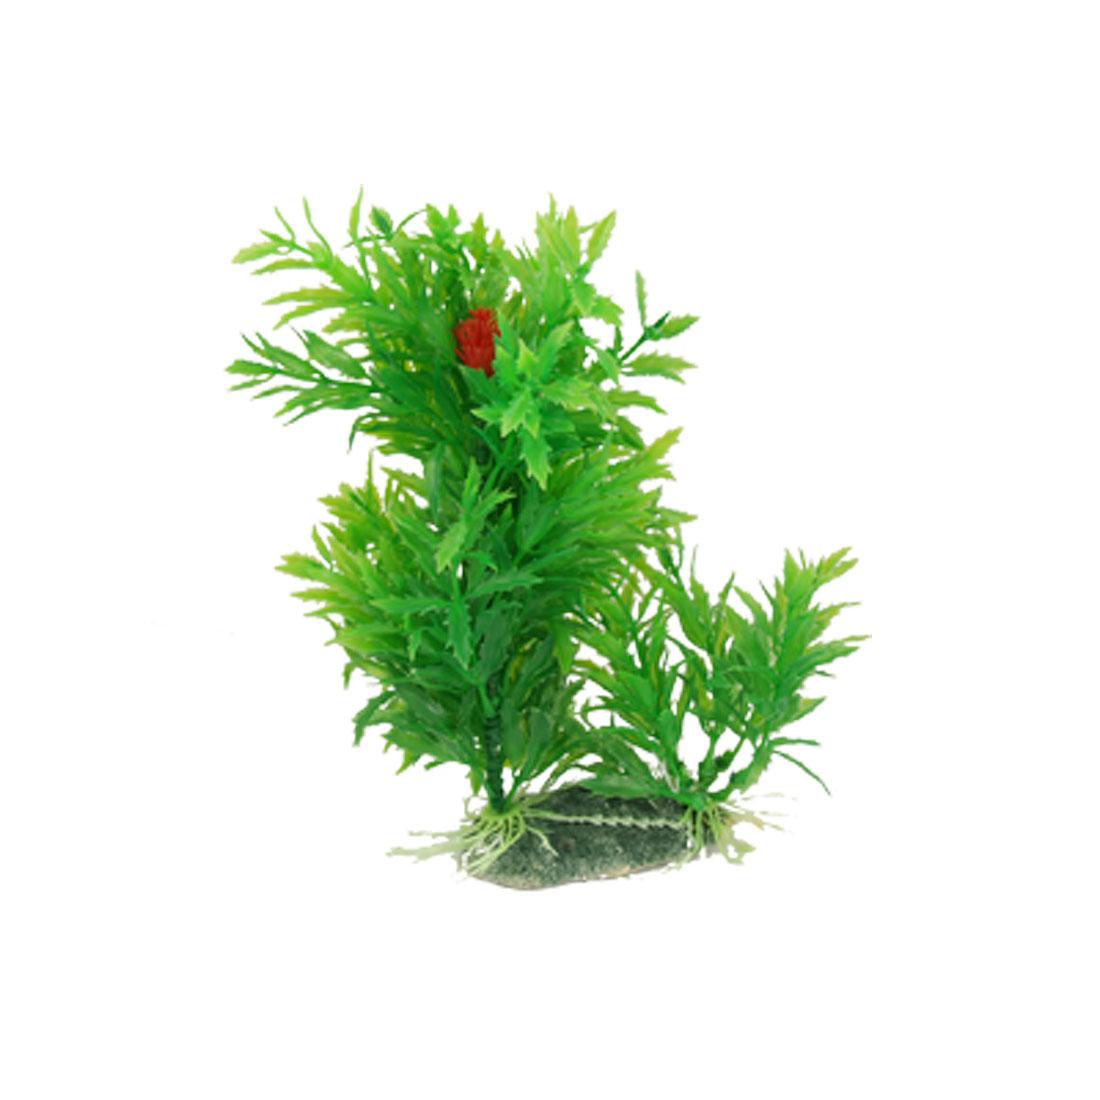 "Green Leaf 7.1"" High Plastic Plant Aquascaping for Aquarium"